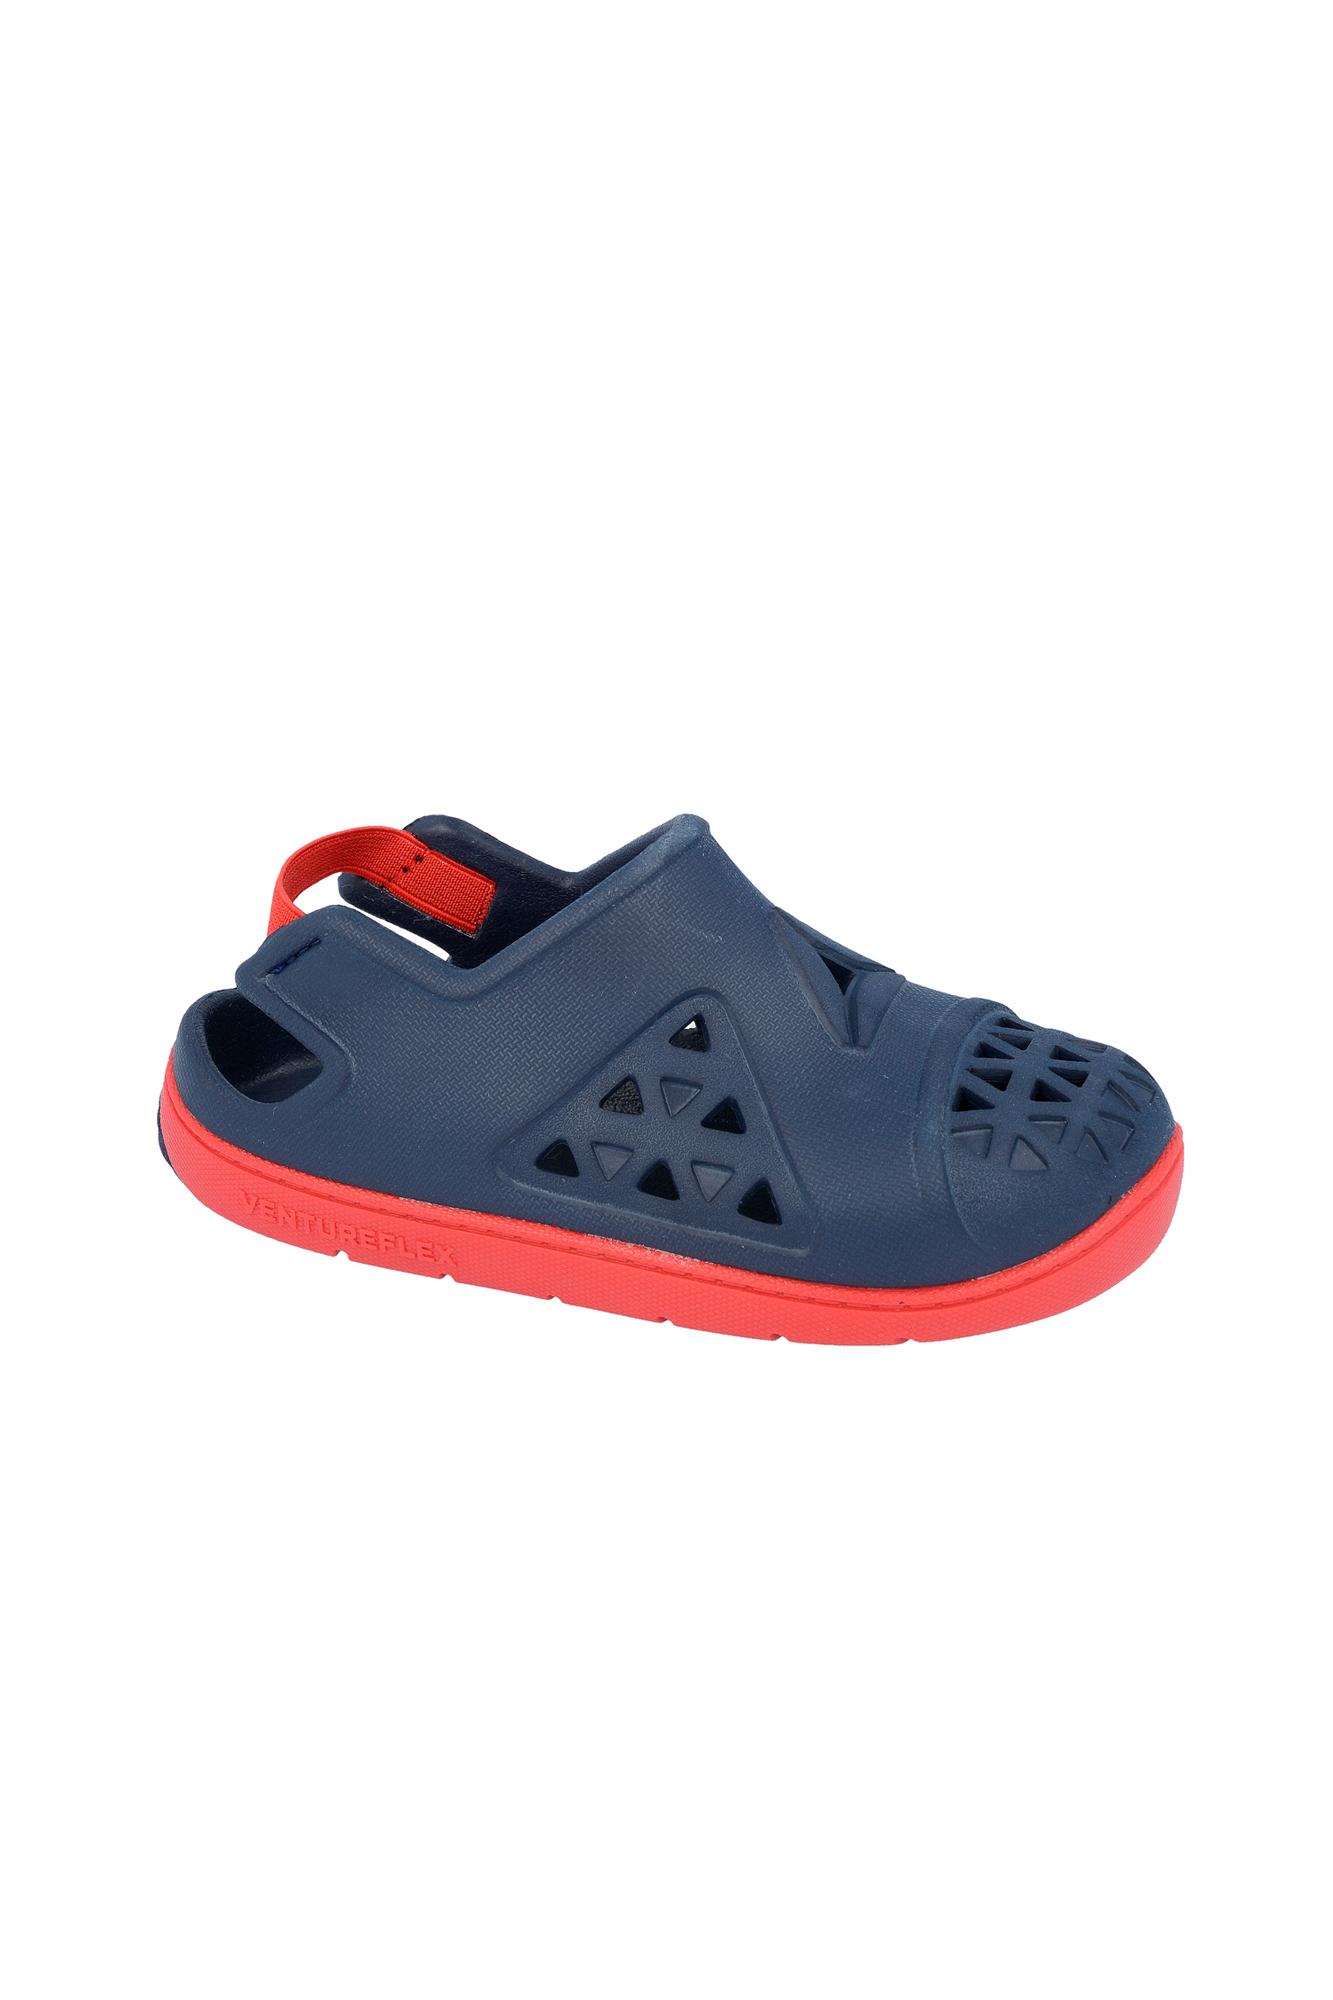 cc36c0c3507 Sandały Reebok Ventureflex Sandal 4 - BD5068   Na co dzień   Buty ...